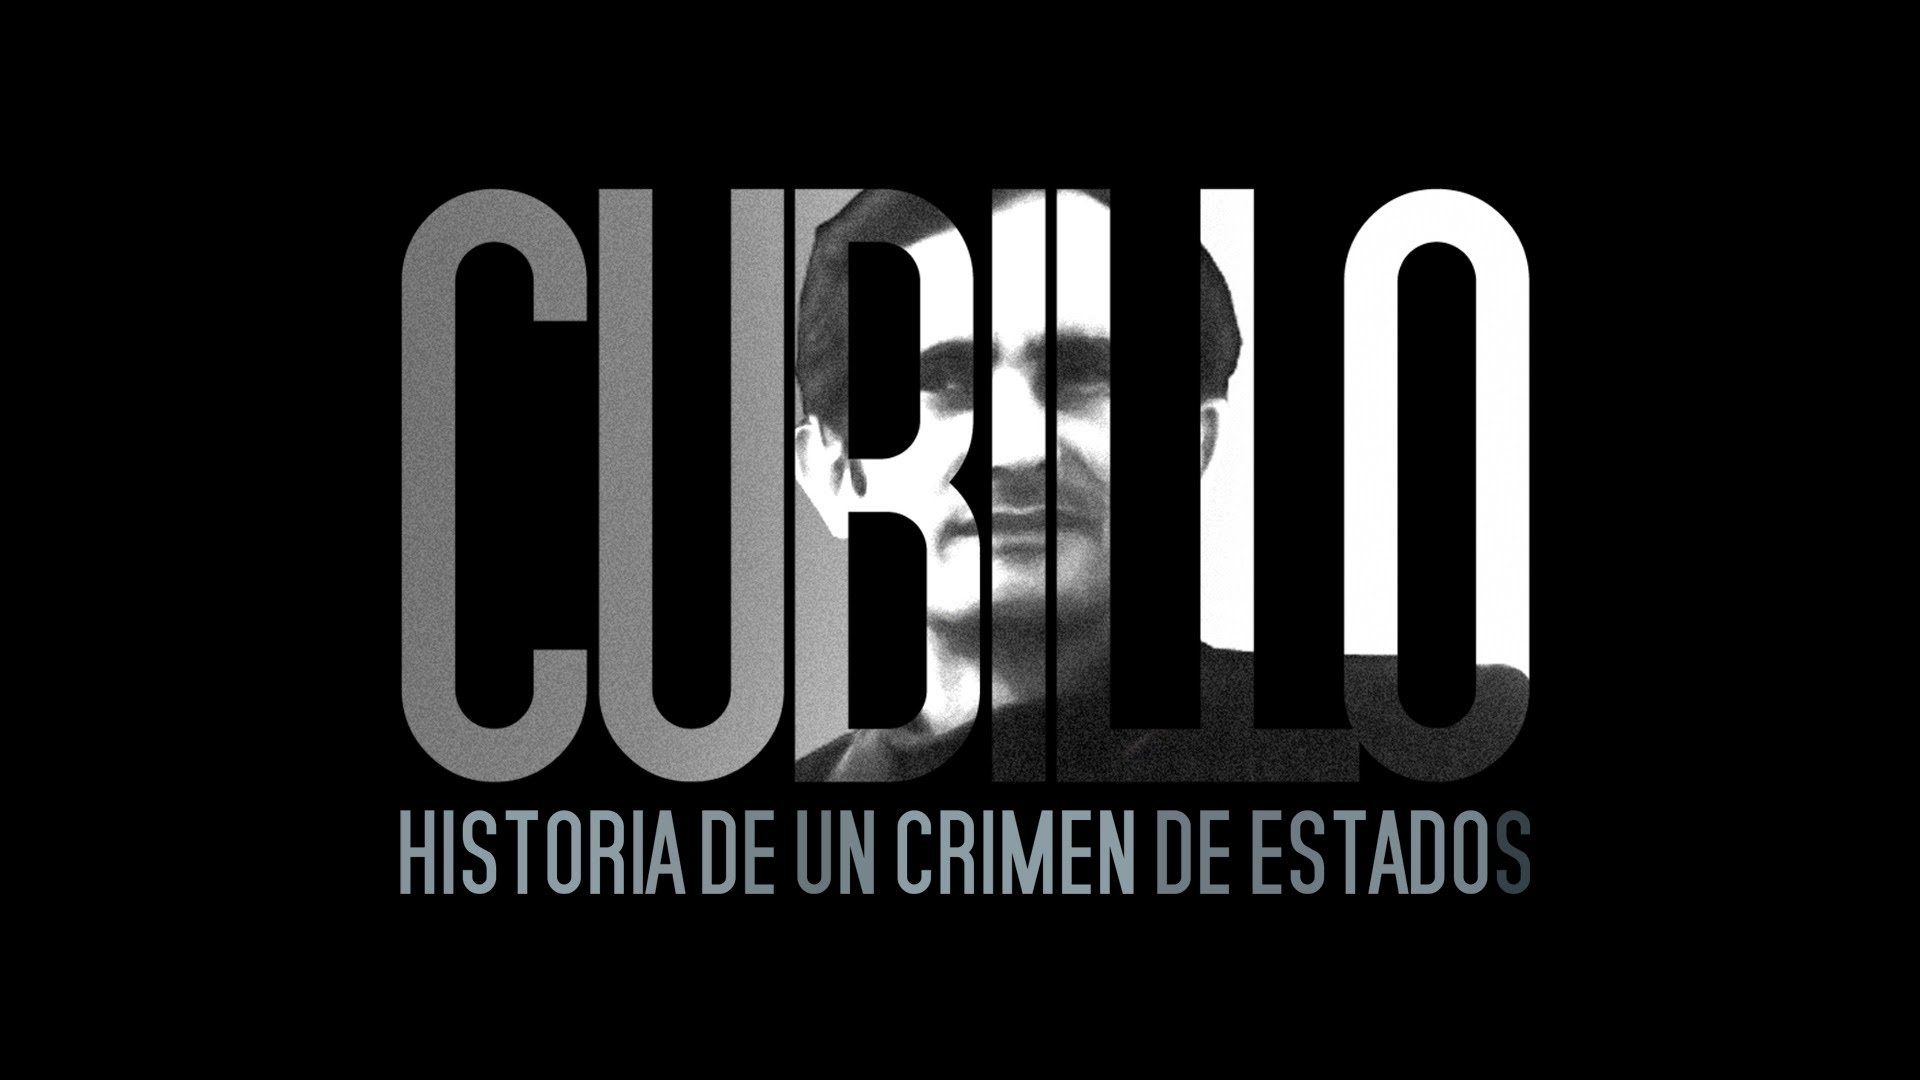 Cubillo, historia de un crimen de estado.